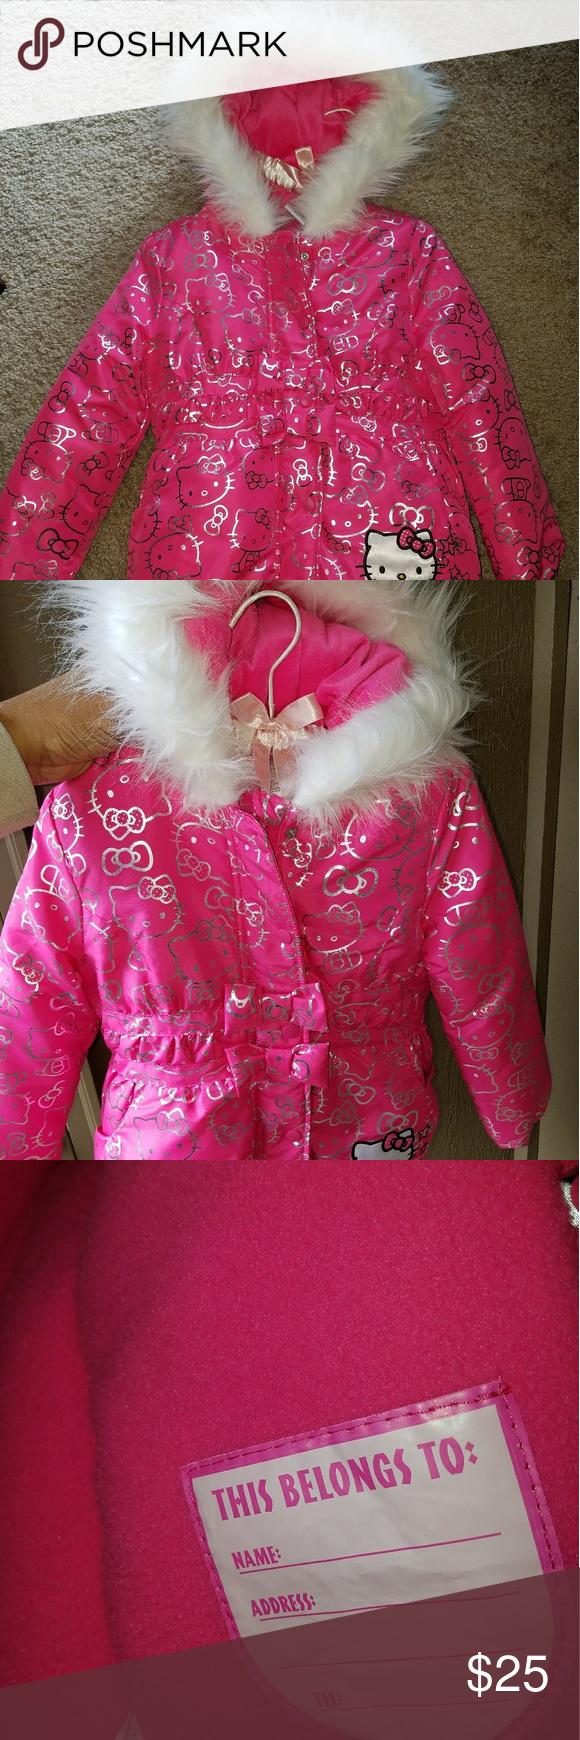 41ec305b1 Hello Kitty Girls puffer jacket size 5/6 Super cute little girls' Hello  Kitty puffer jacket w/ faux fur hood. Fleece lined, 100% polyester. Girls  size 5/6.